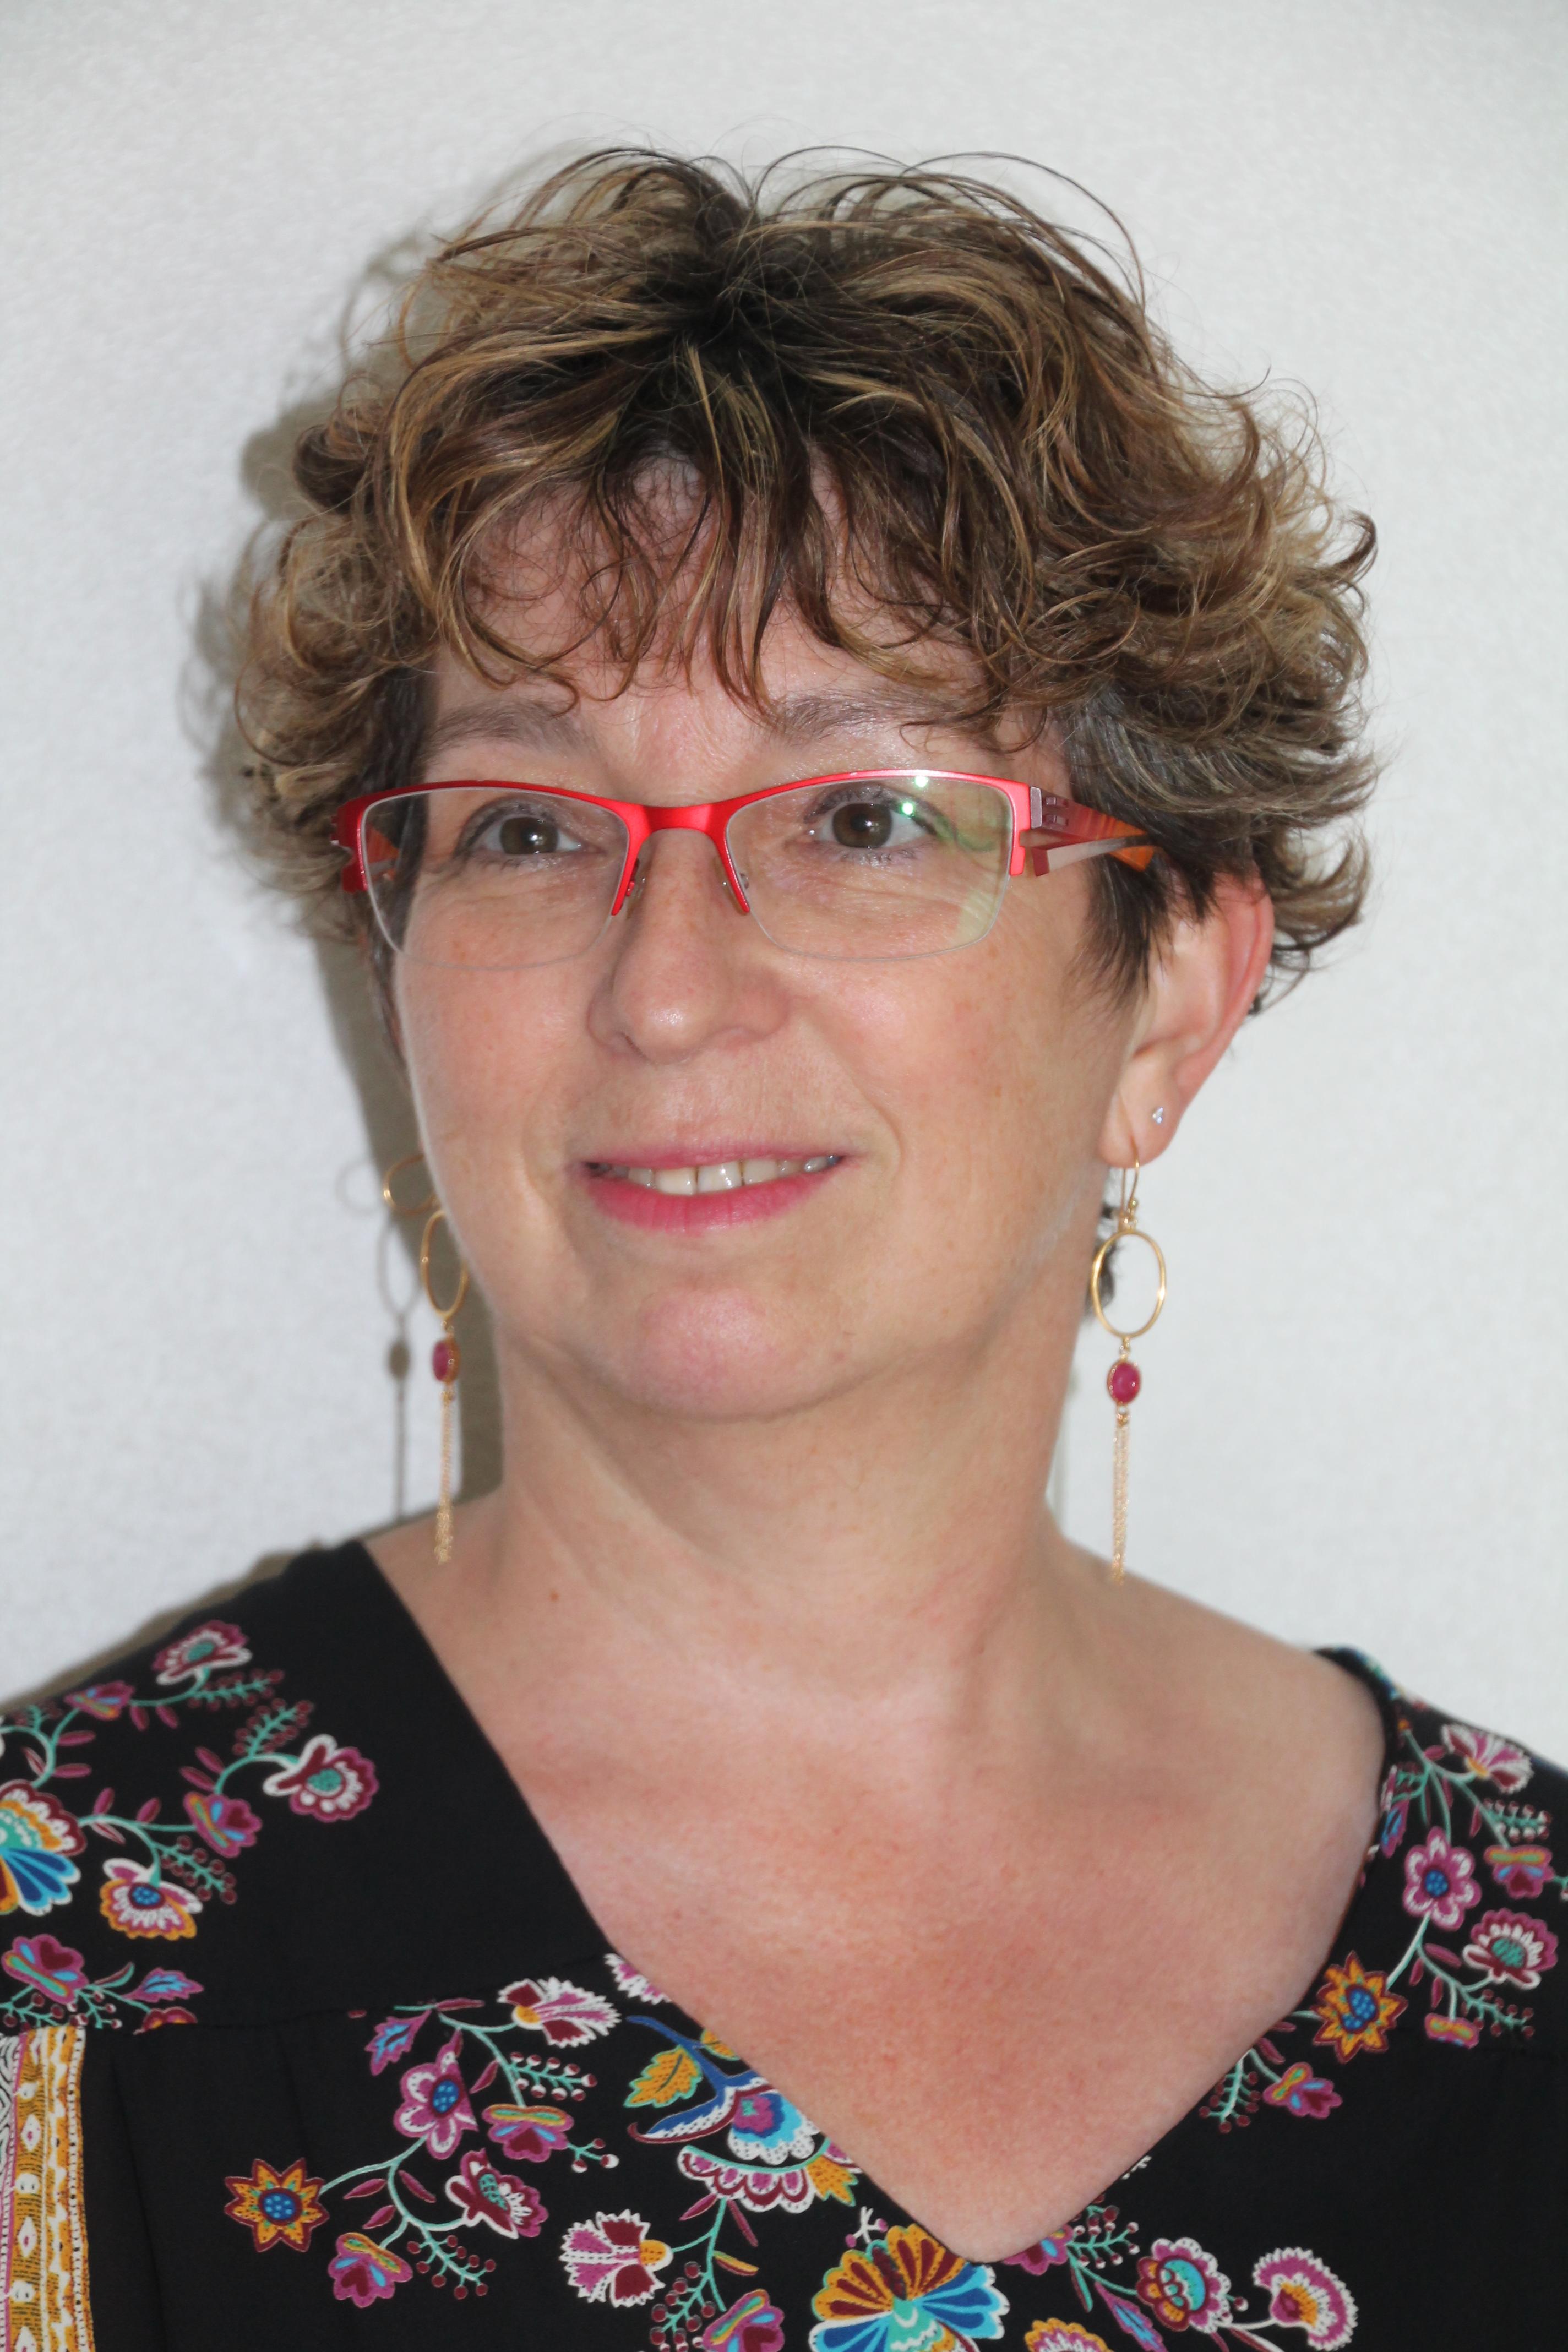 Nathalie Migallon